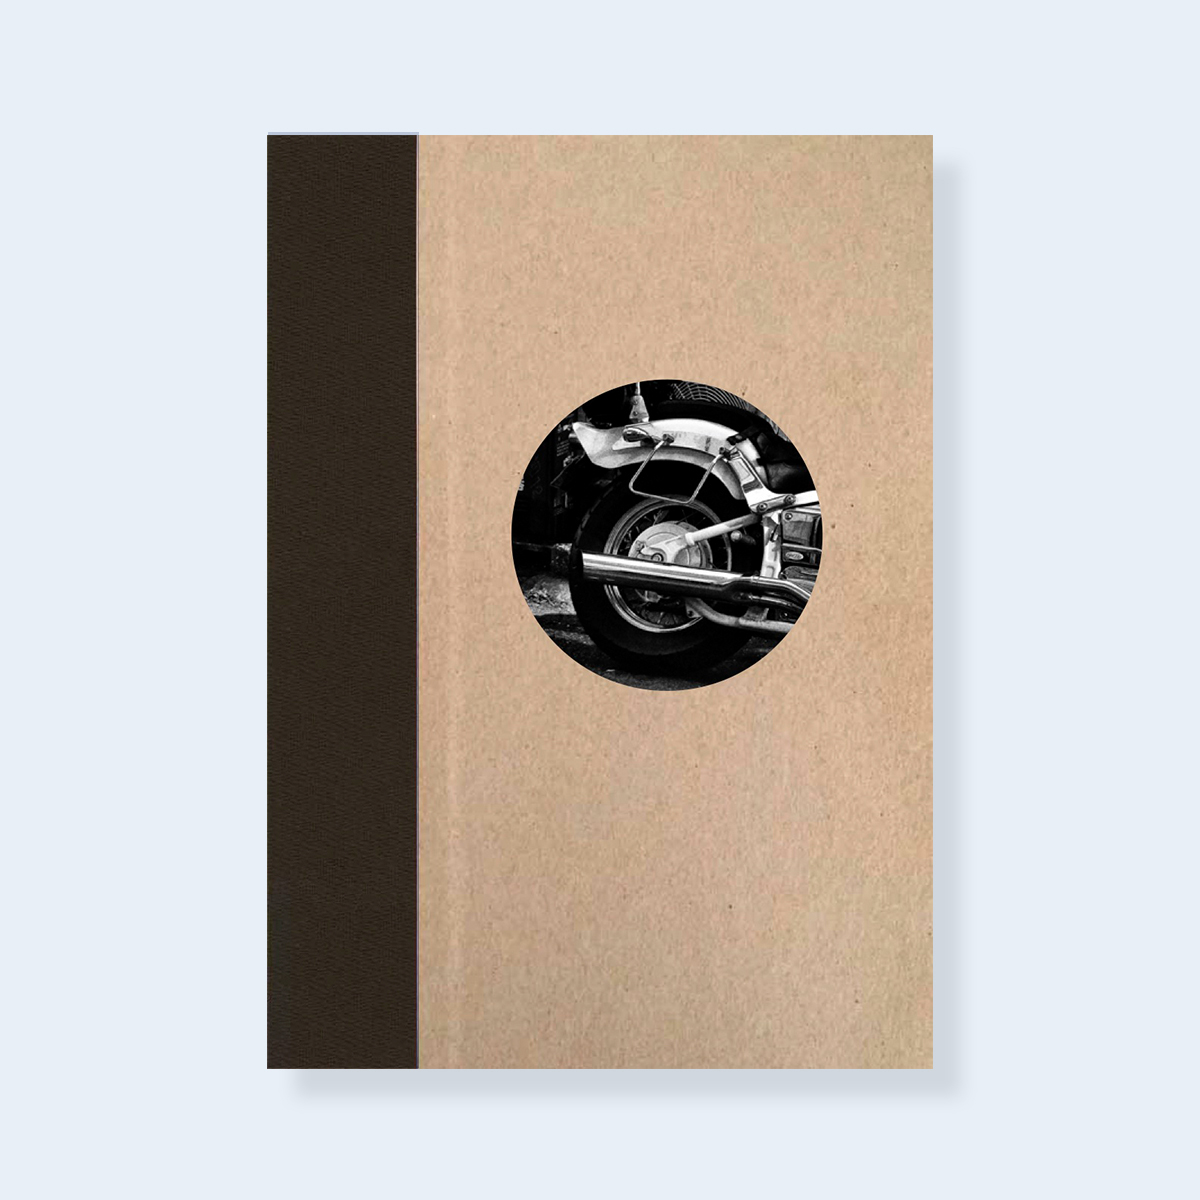 DAIDO MORIYAMA | Daido Moto | One Picture Book Two #10 |  Order >